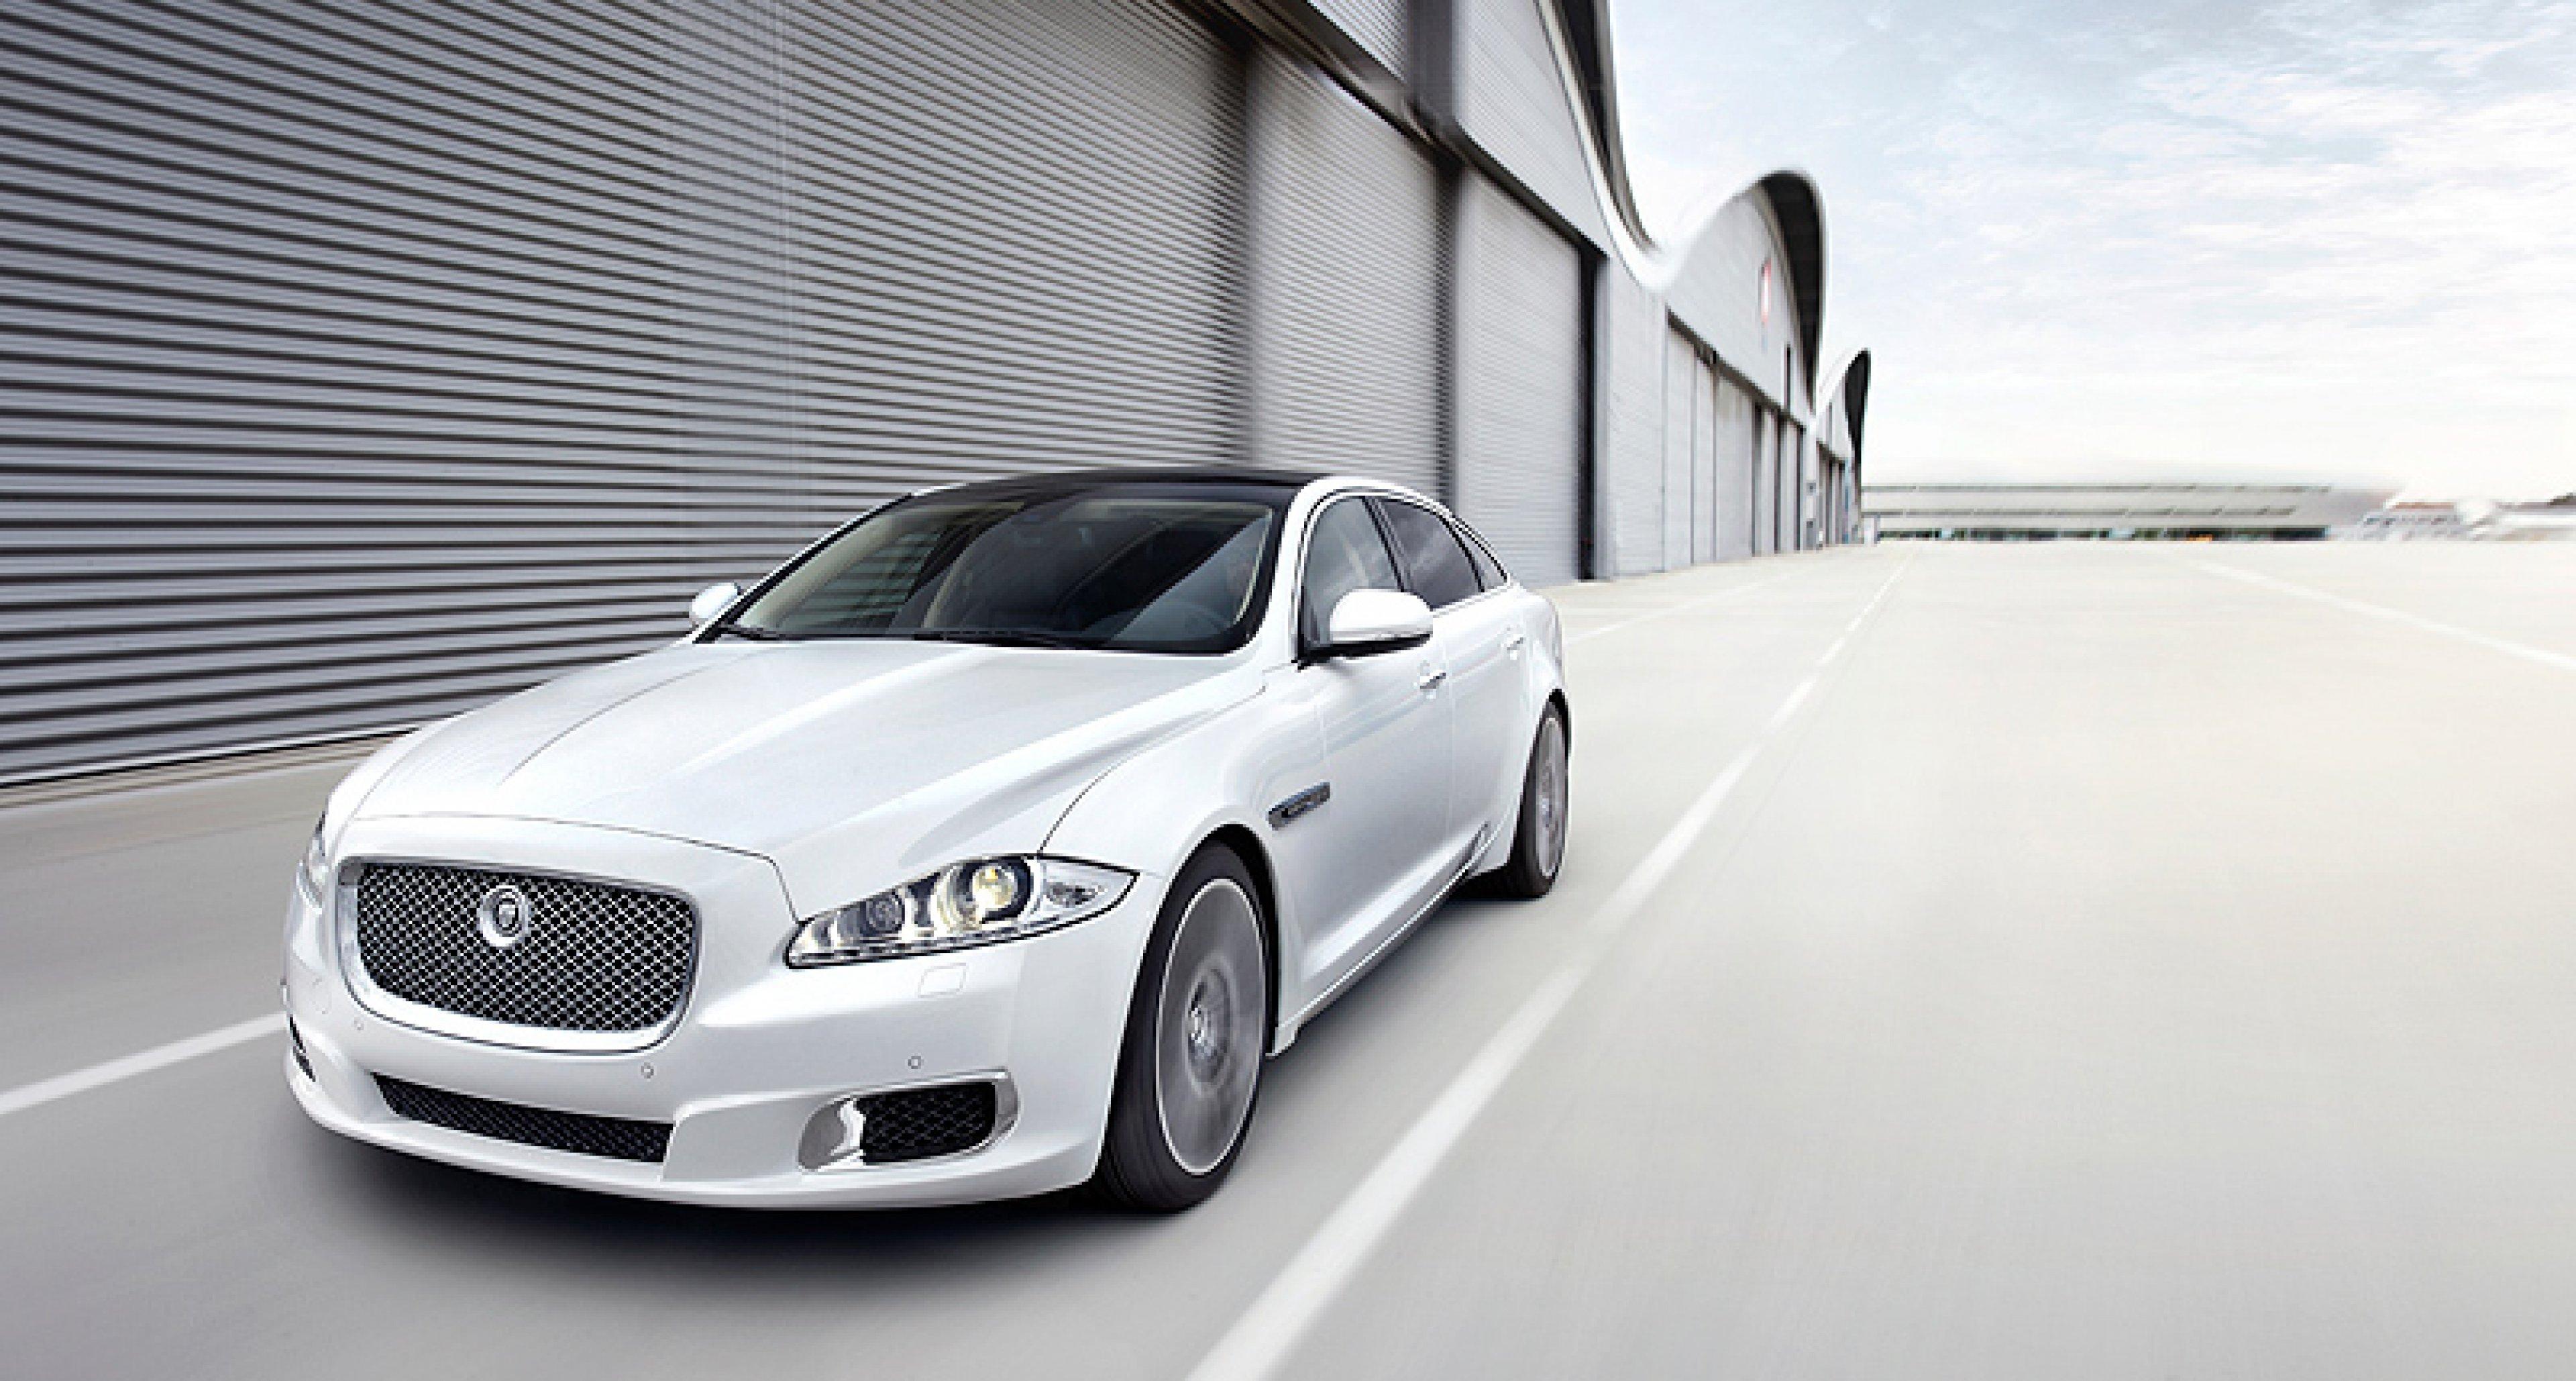 Jaguar XJ Ultimate: Die feinste englische Fahrt